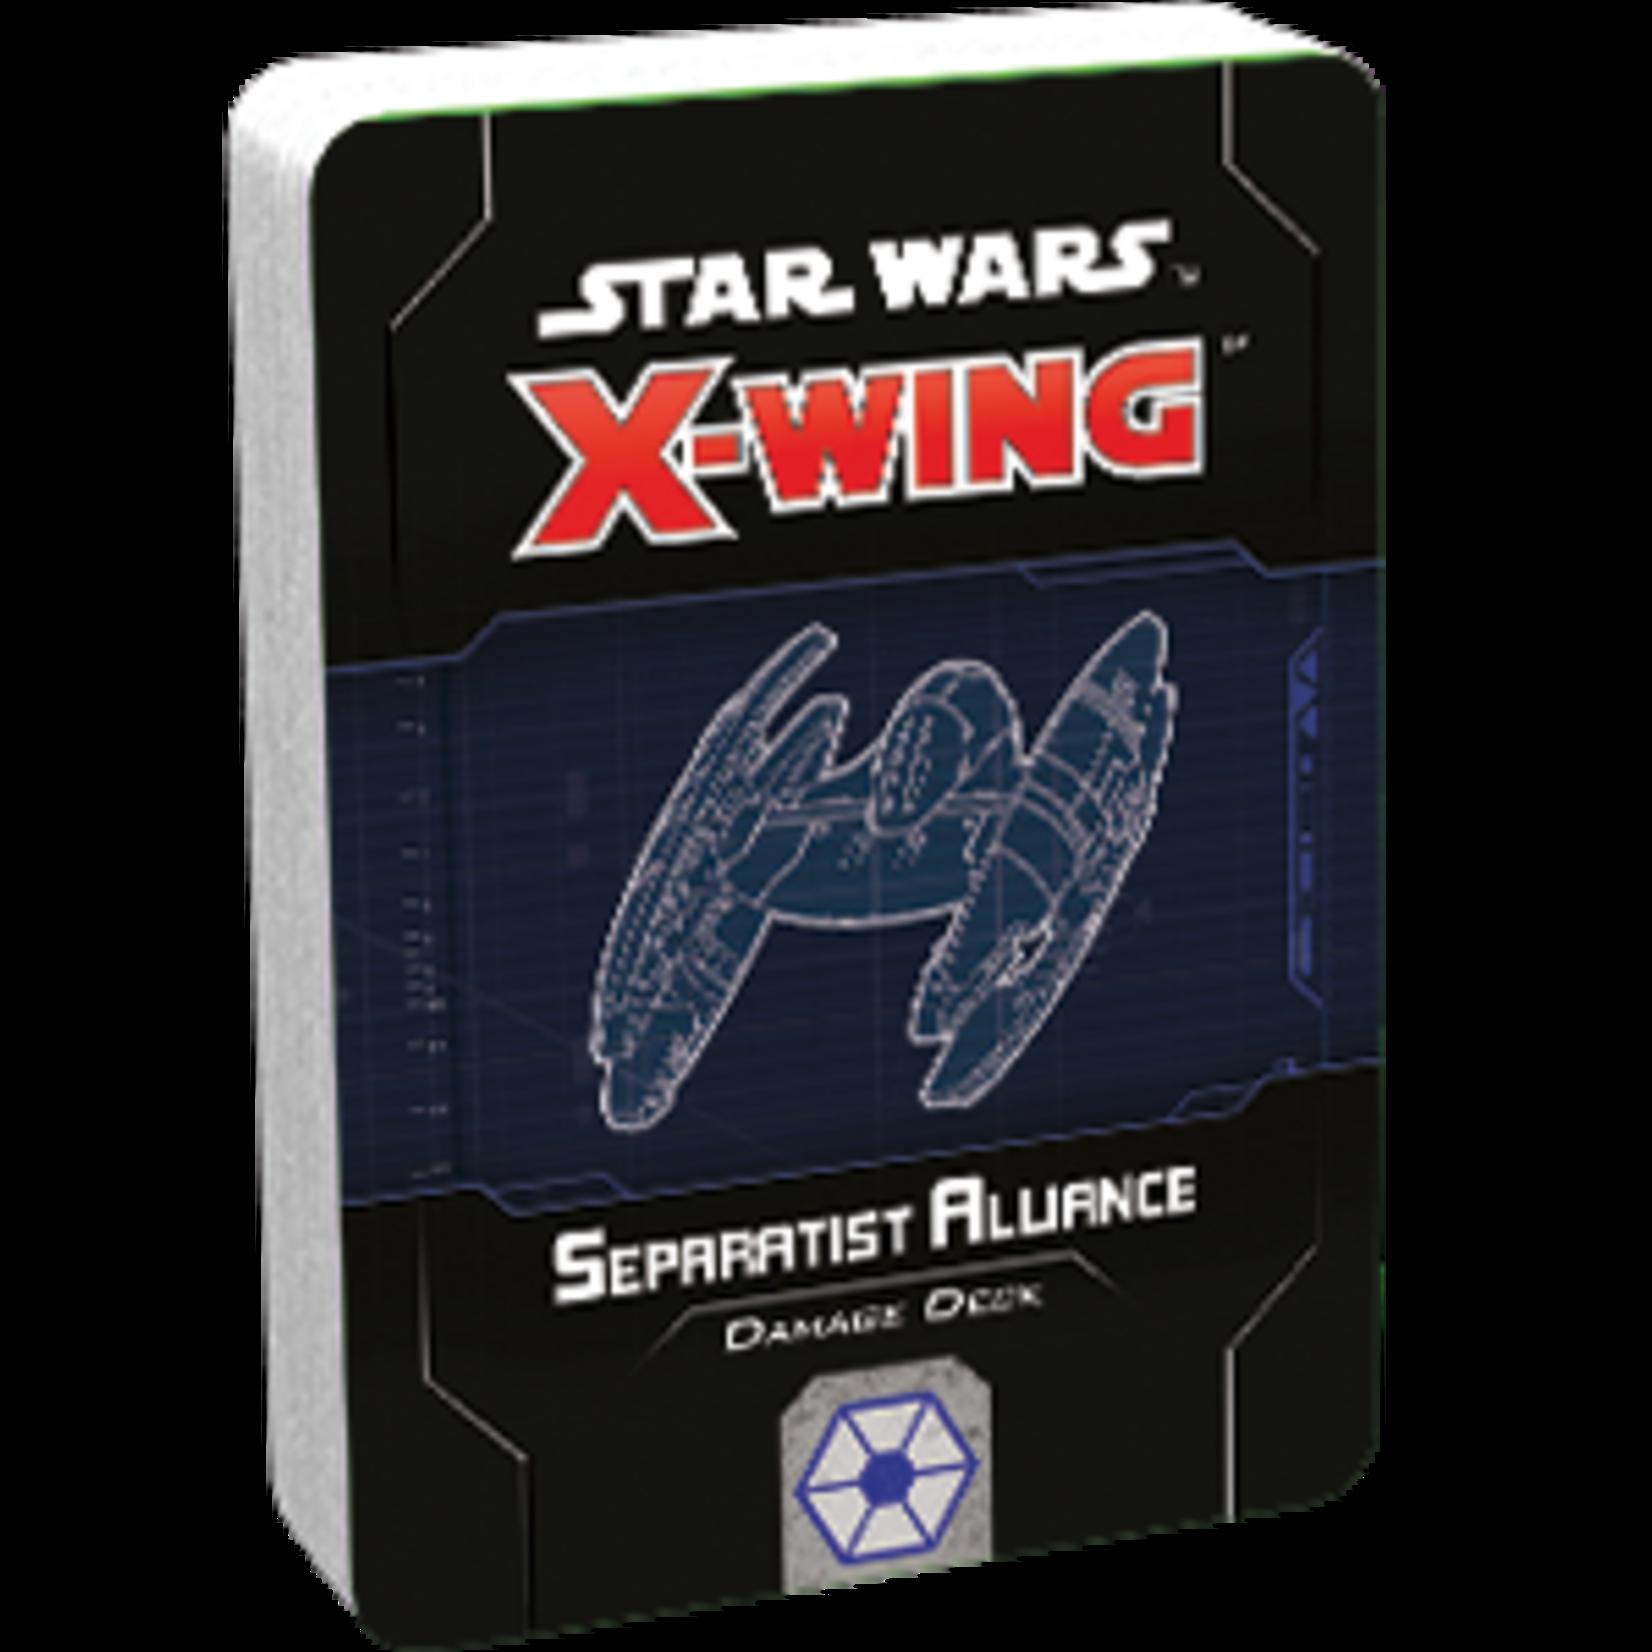 Fantasy Flight Games Star Wars X-Wing 2nd Edition: Separatist Alliance Damage Deck Expansion Pack